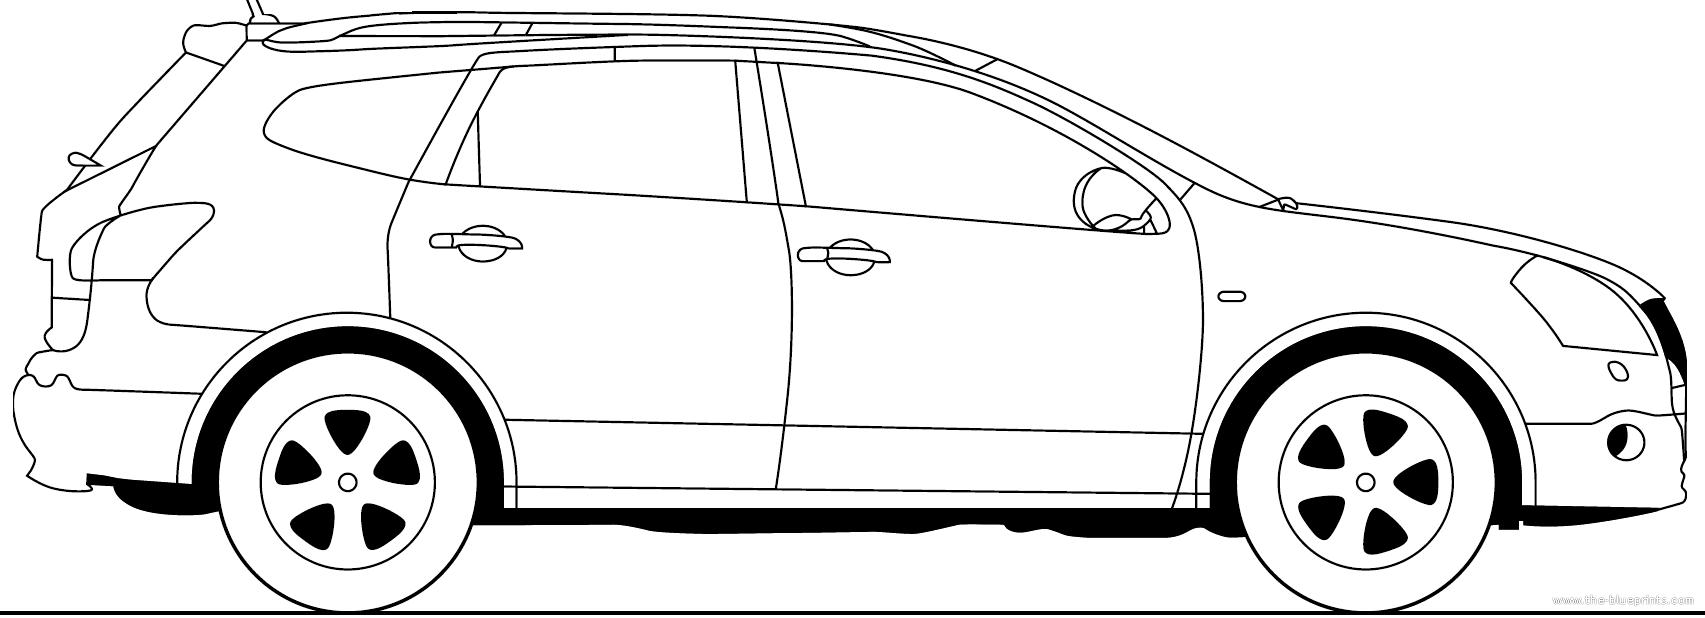 Blueprints > Cars > Nissan > Nissan Qashqai +2 (2013)